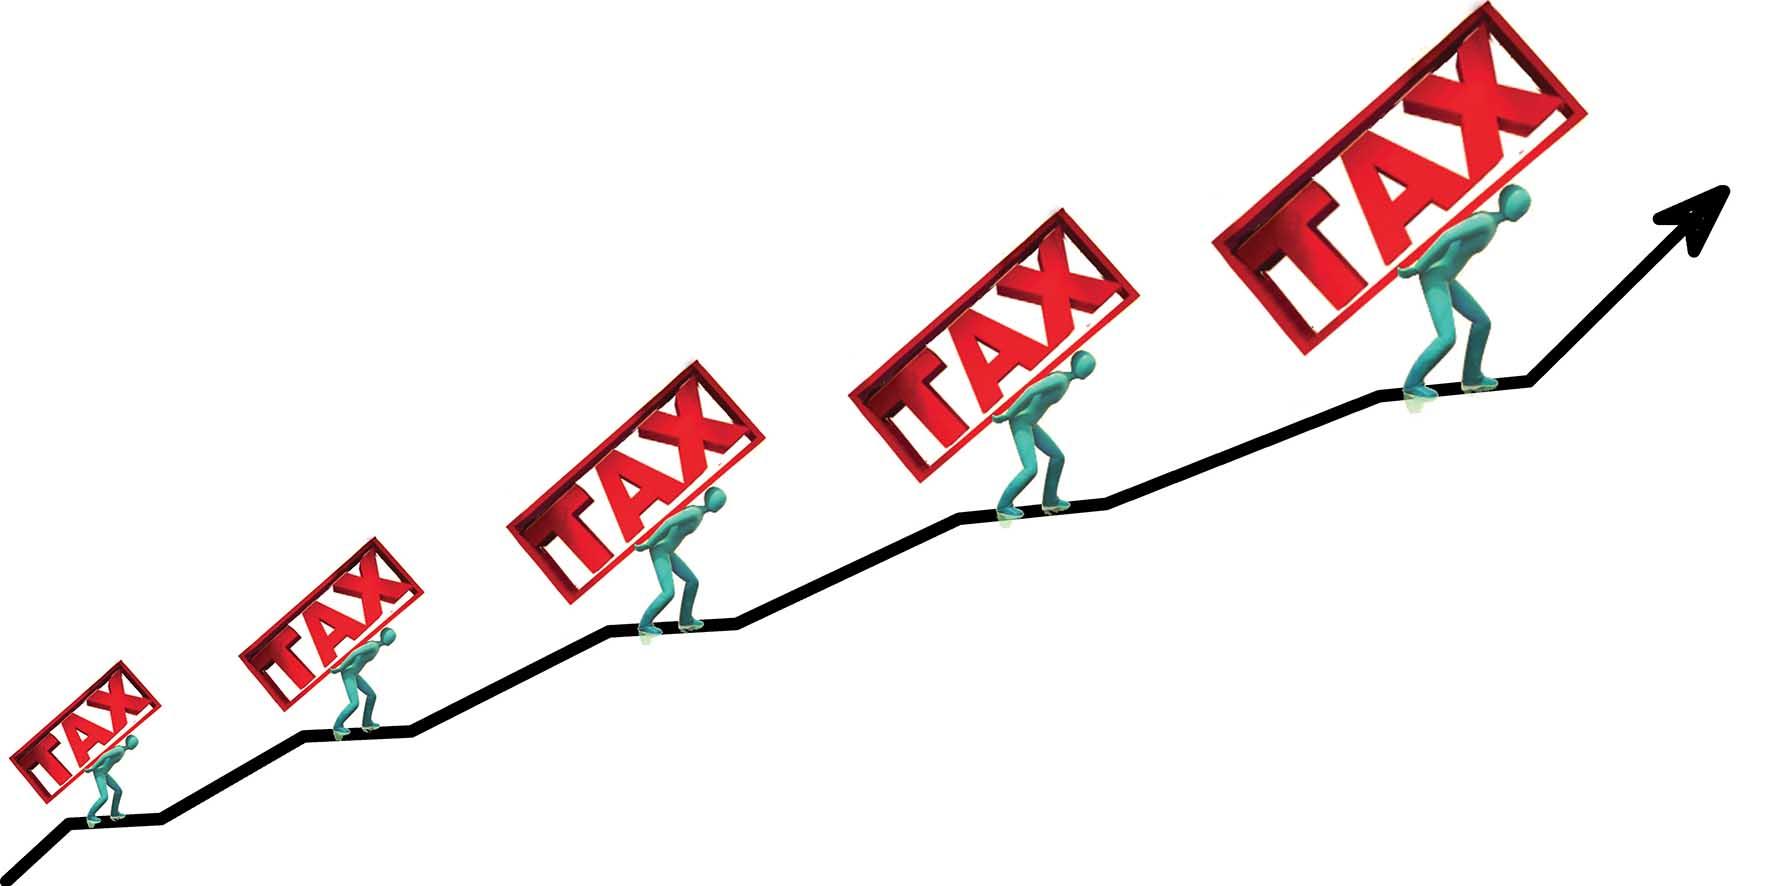 grafico crescita peso tasse